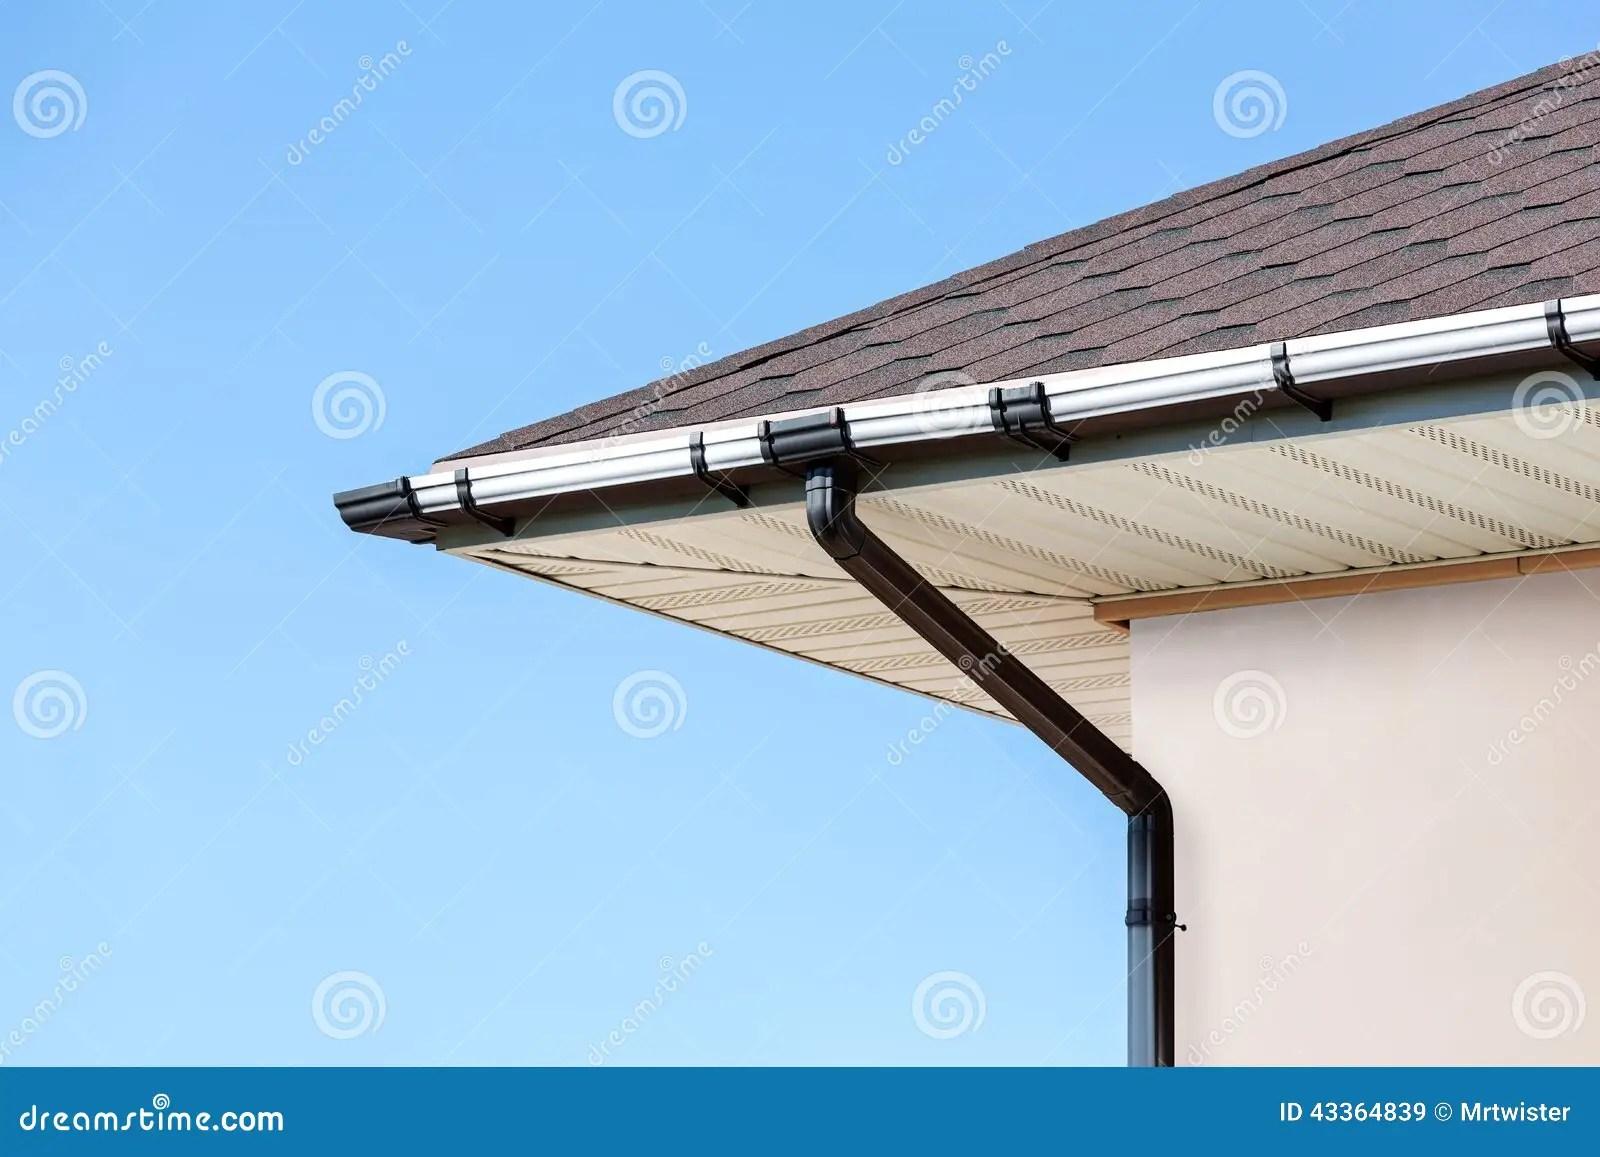 House Drain Pipe